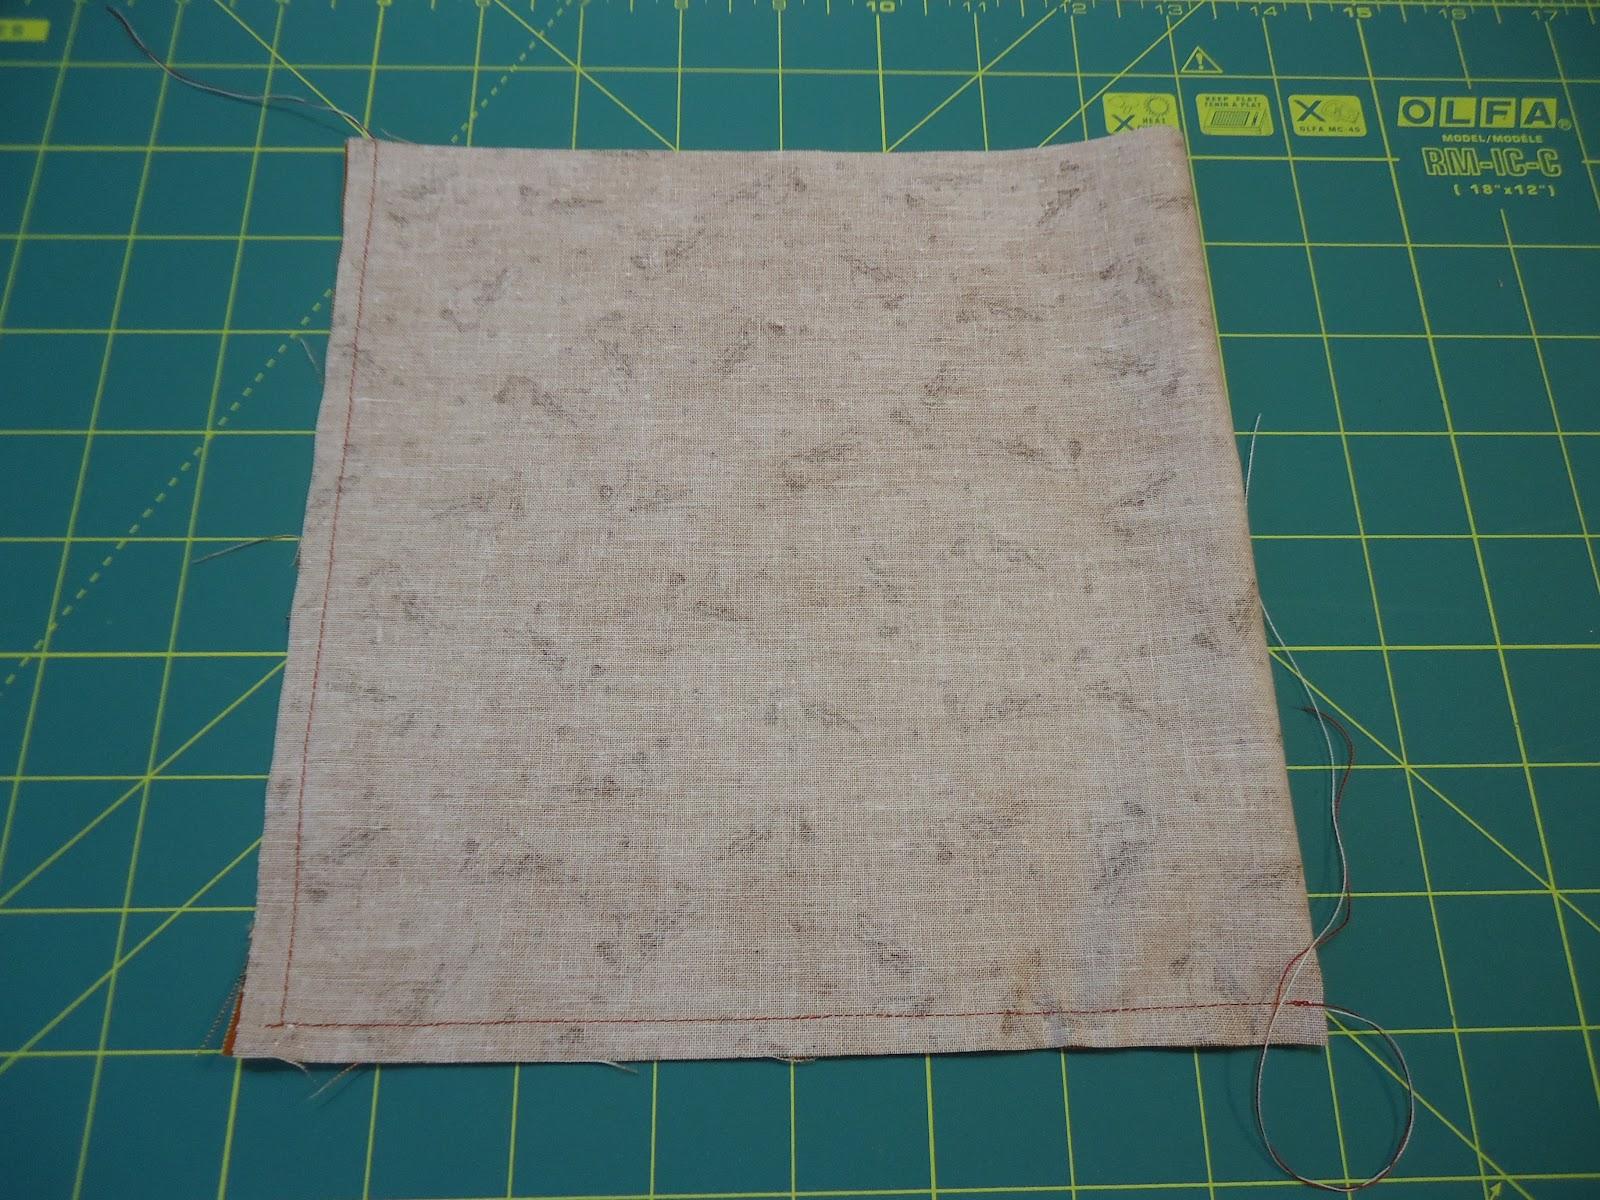 30 pulgadas de nylon cosido con